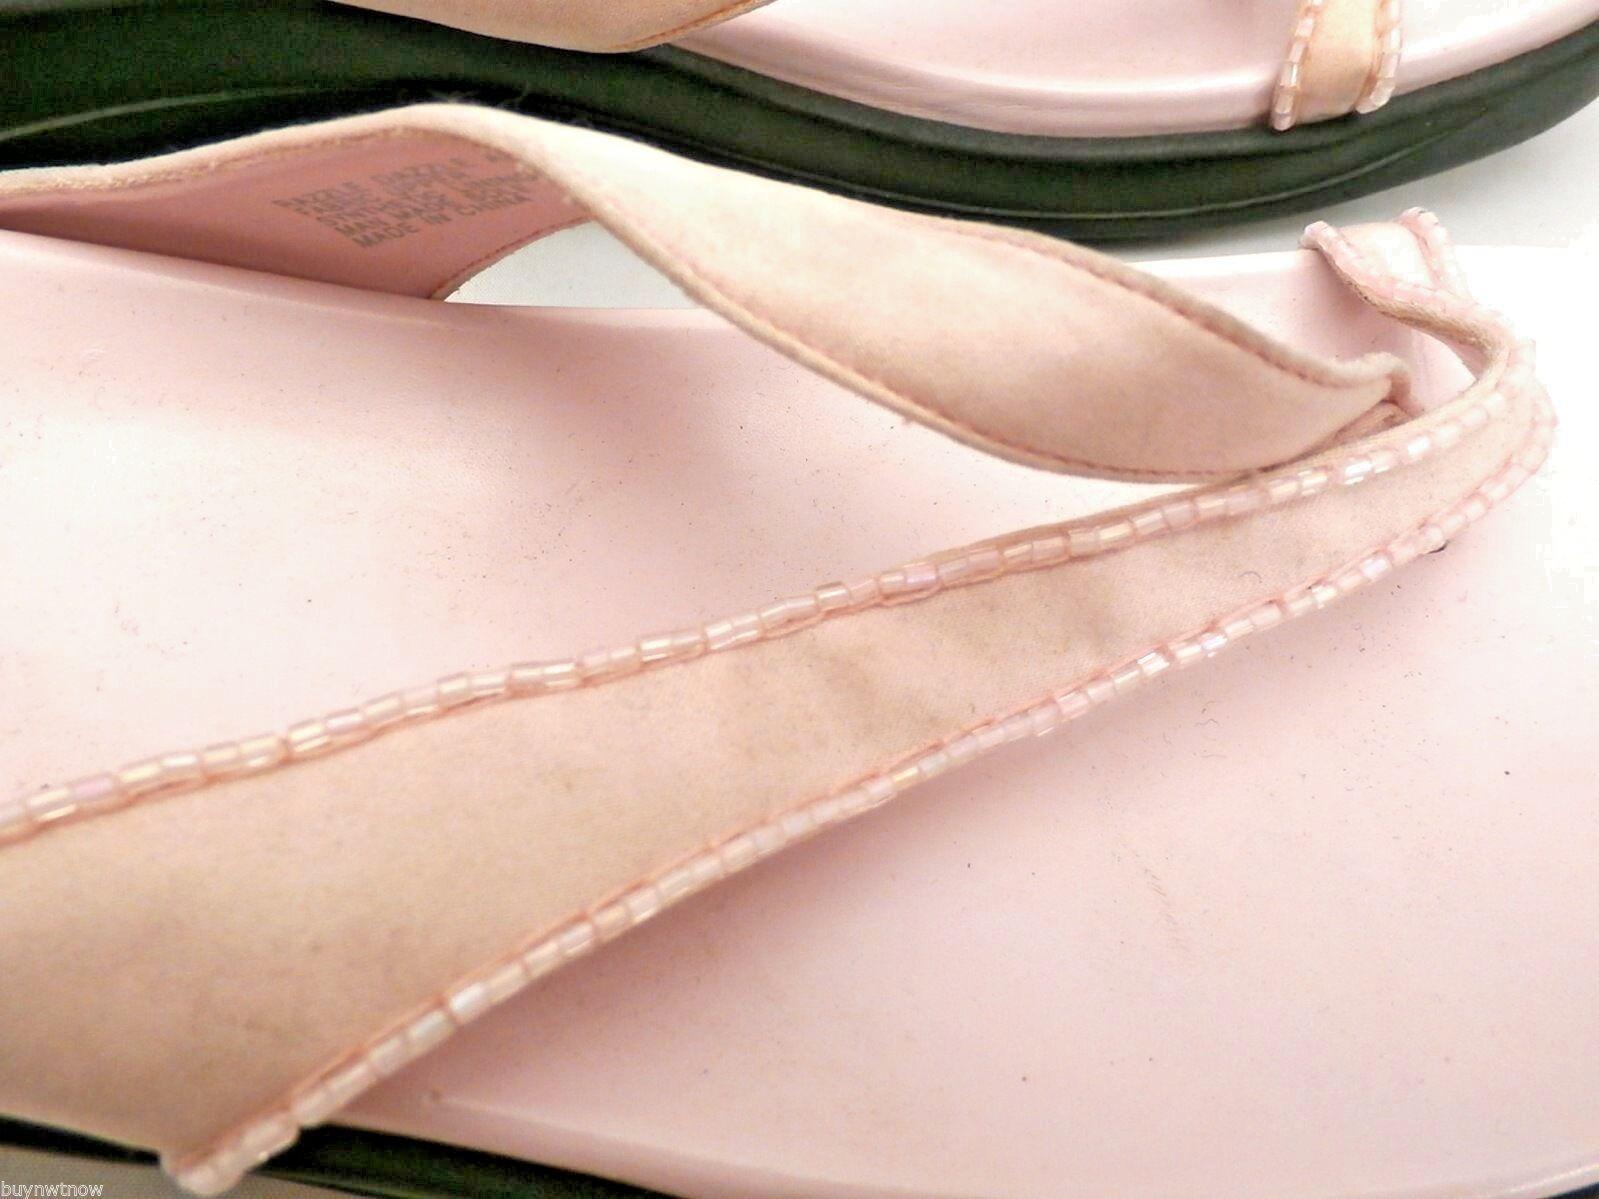 Kenneth Cole Reaction Pink Razzle Dazzle Thongs Flip Flops Sandals Womens 10 image 4